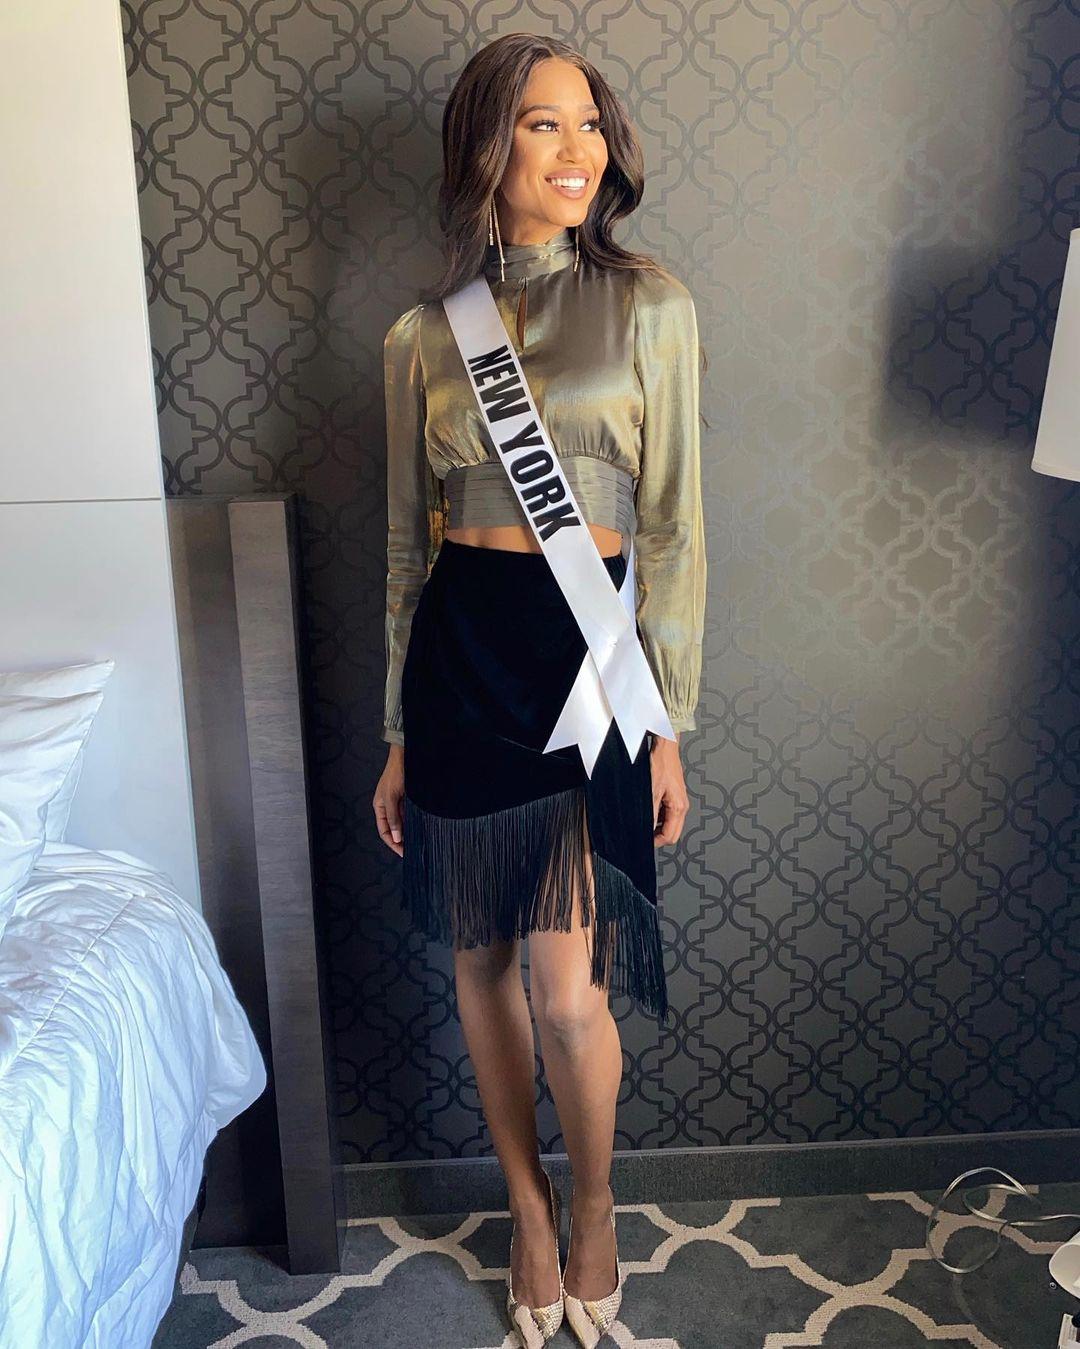 andreia gibau, top 10 de miss usa 2020/top 16 de miss earth 2017. - Página 17 Andrei26